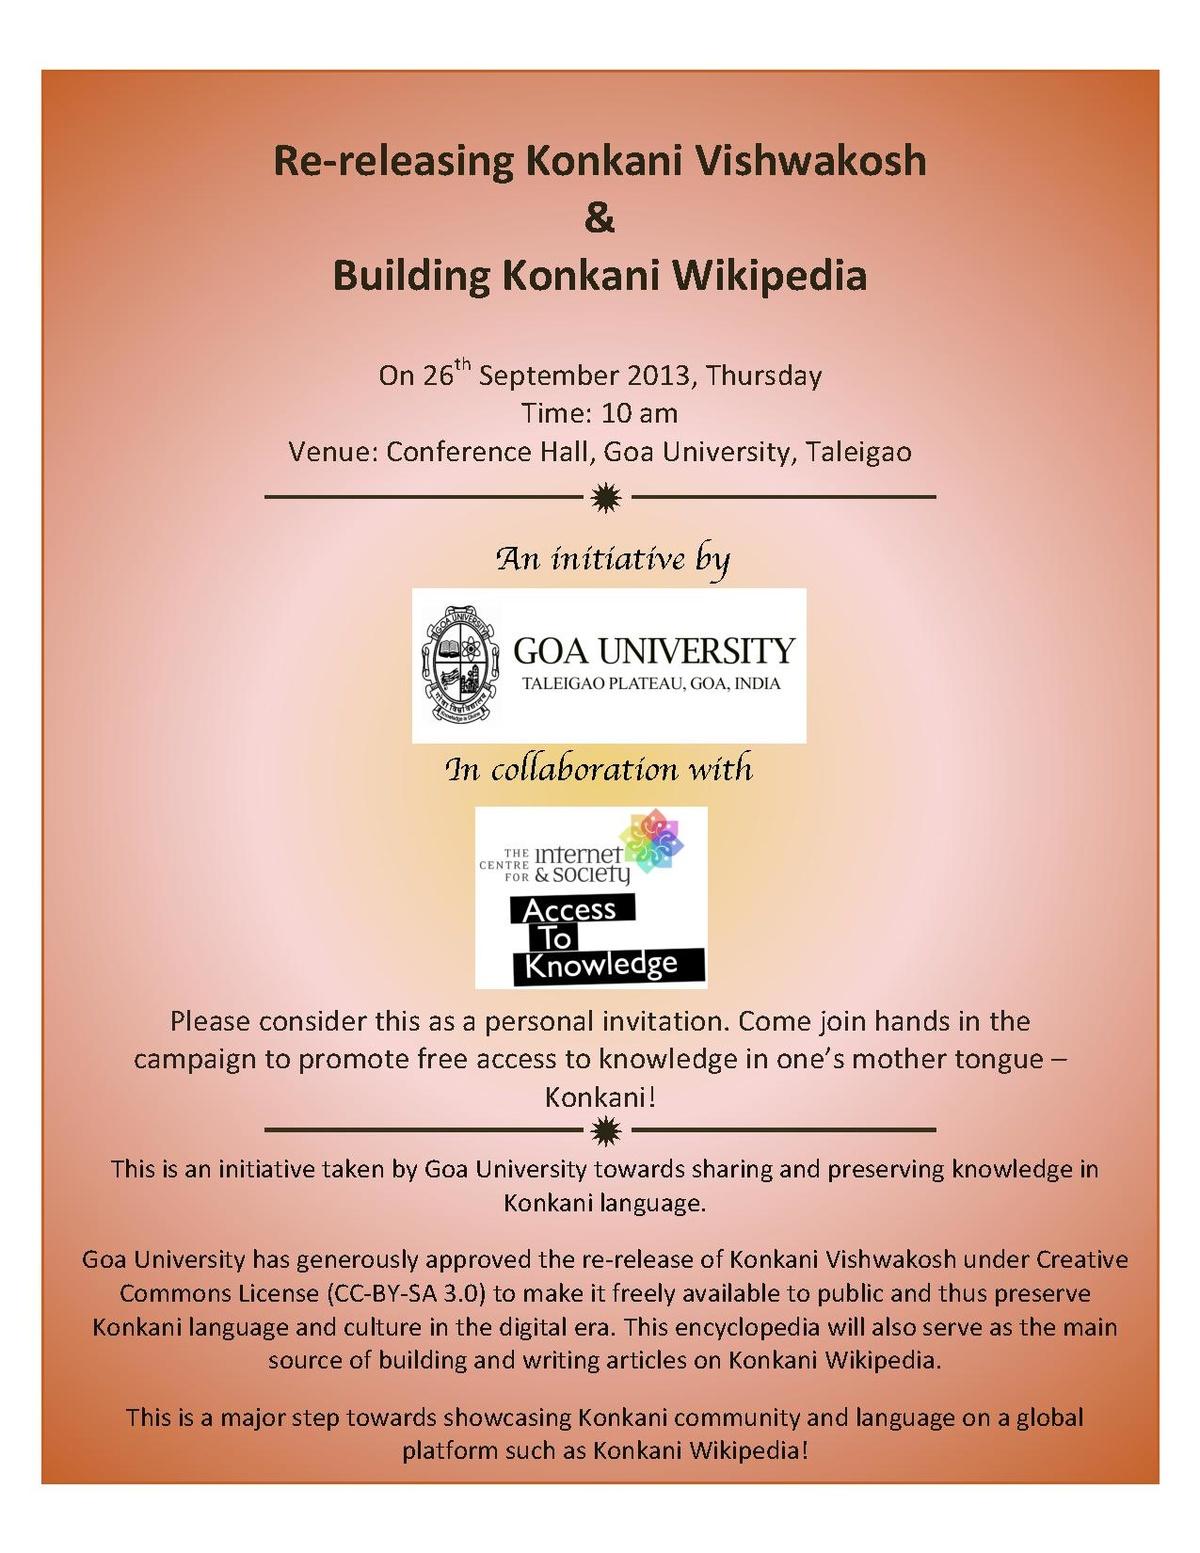 CIS-A2K/Events/Konkani Vishwakosh CC - Meta